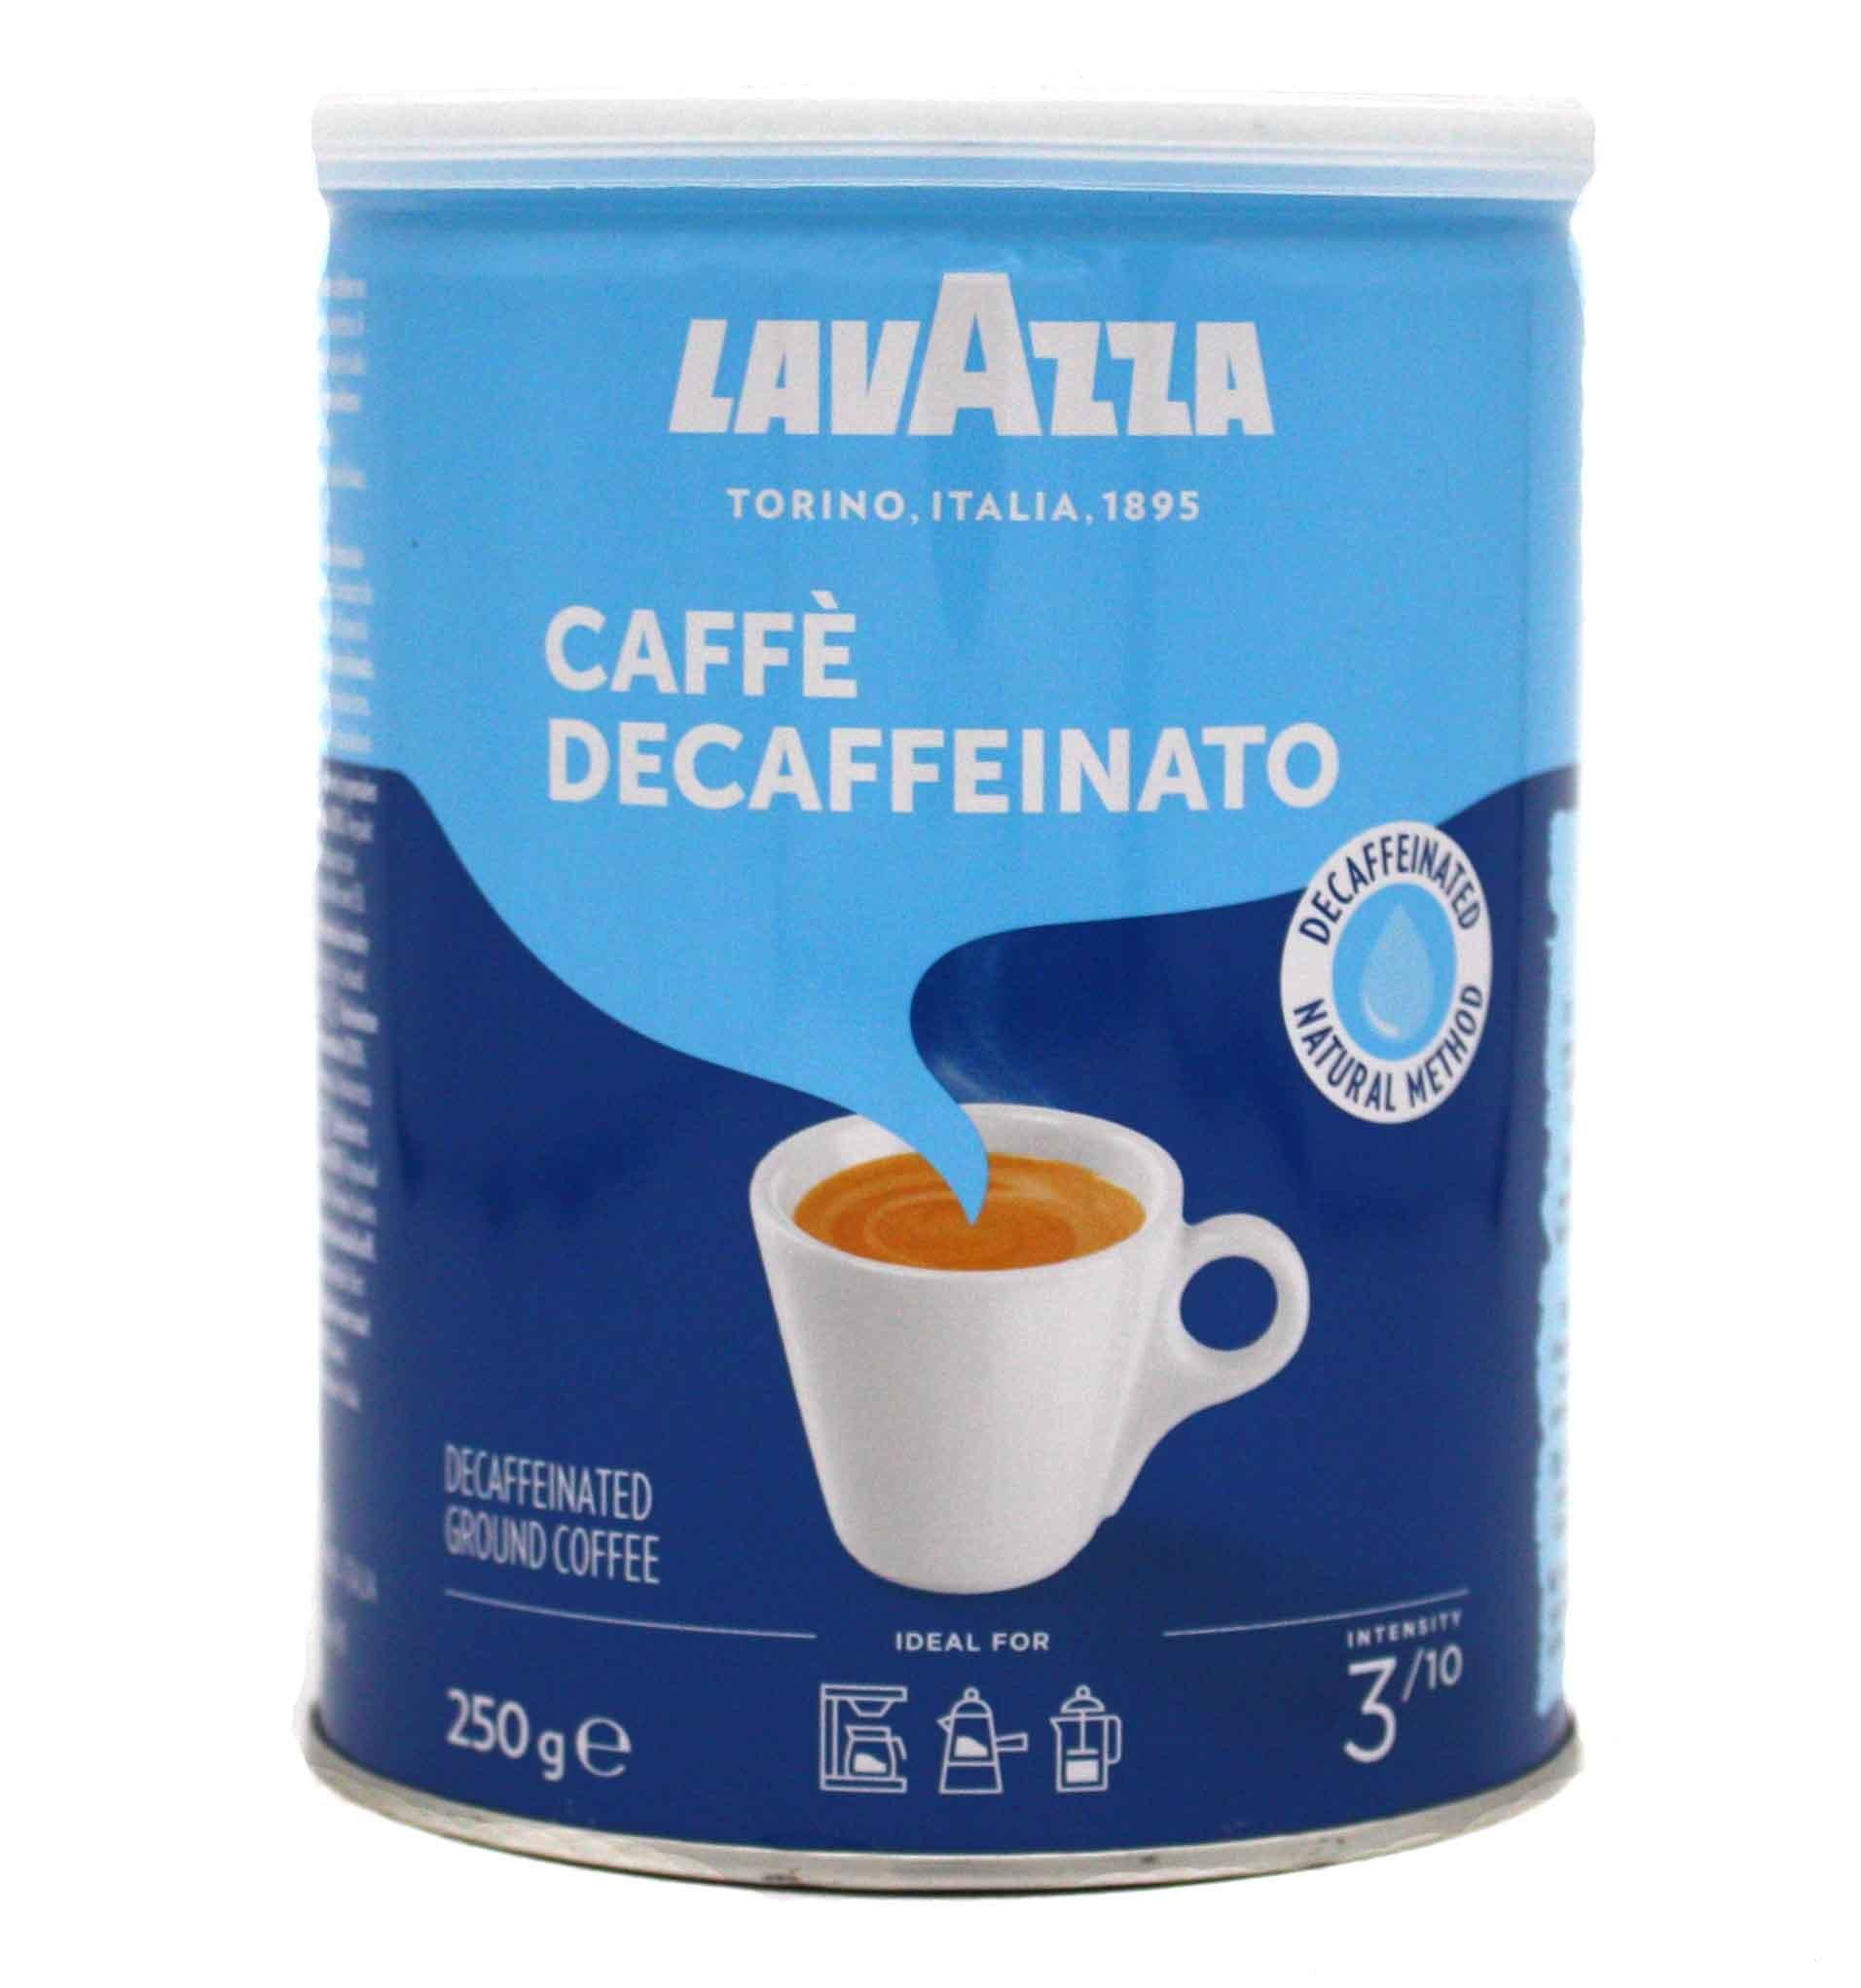 Кофе молотый без кофеина Caffe Decaffeinato, Lavazza, 250 г import_files_71_7195d966ec2211eaa9d1484d7ecee297_4ff6a54deeba11eaa9d3484d7ecee297.jpg